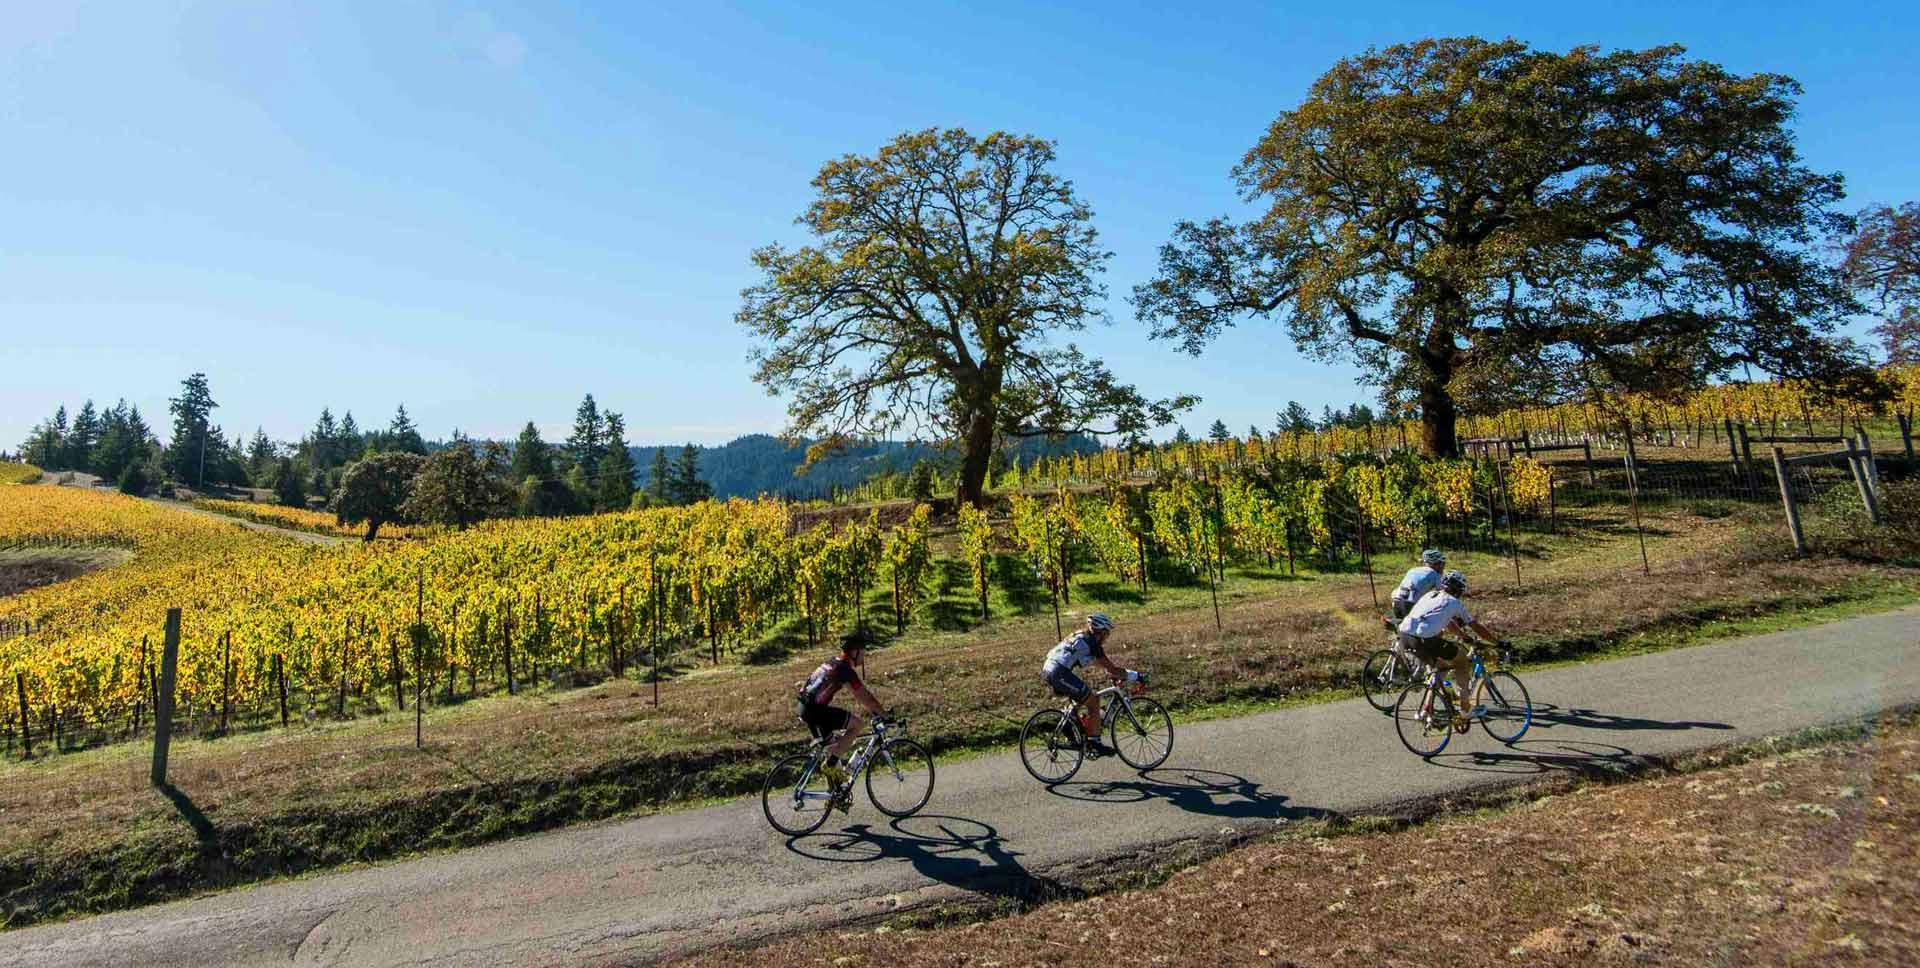 Sonoma County Bike Trails by Skill Level | SonomaCounty com